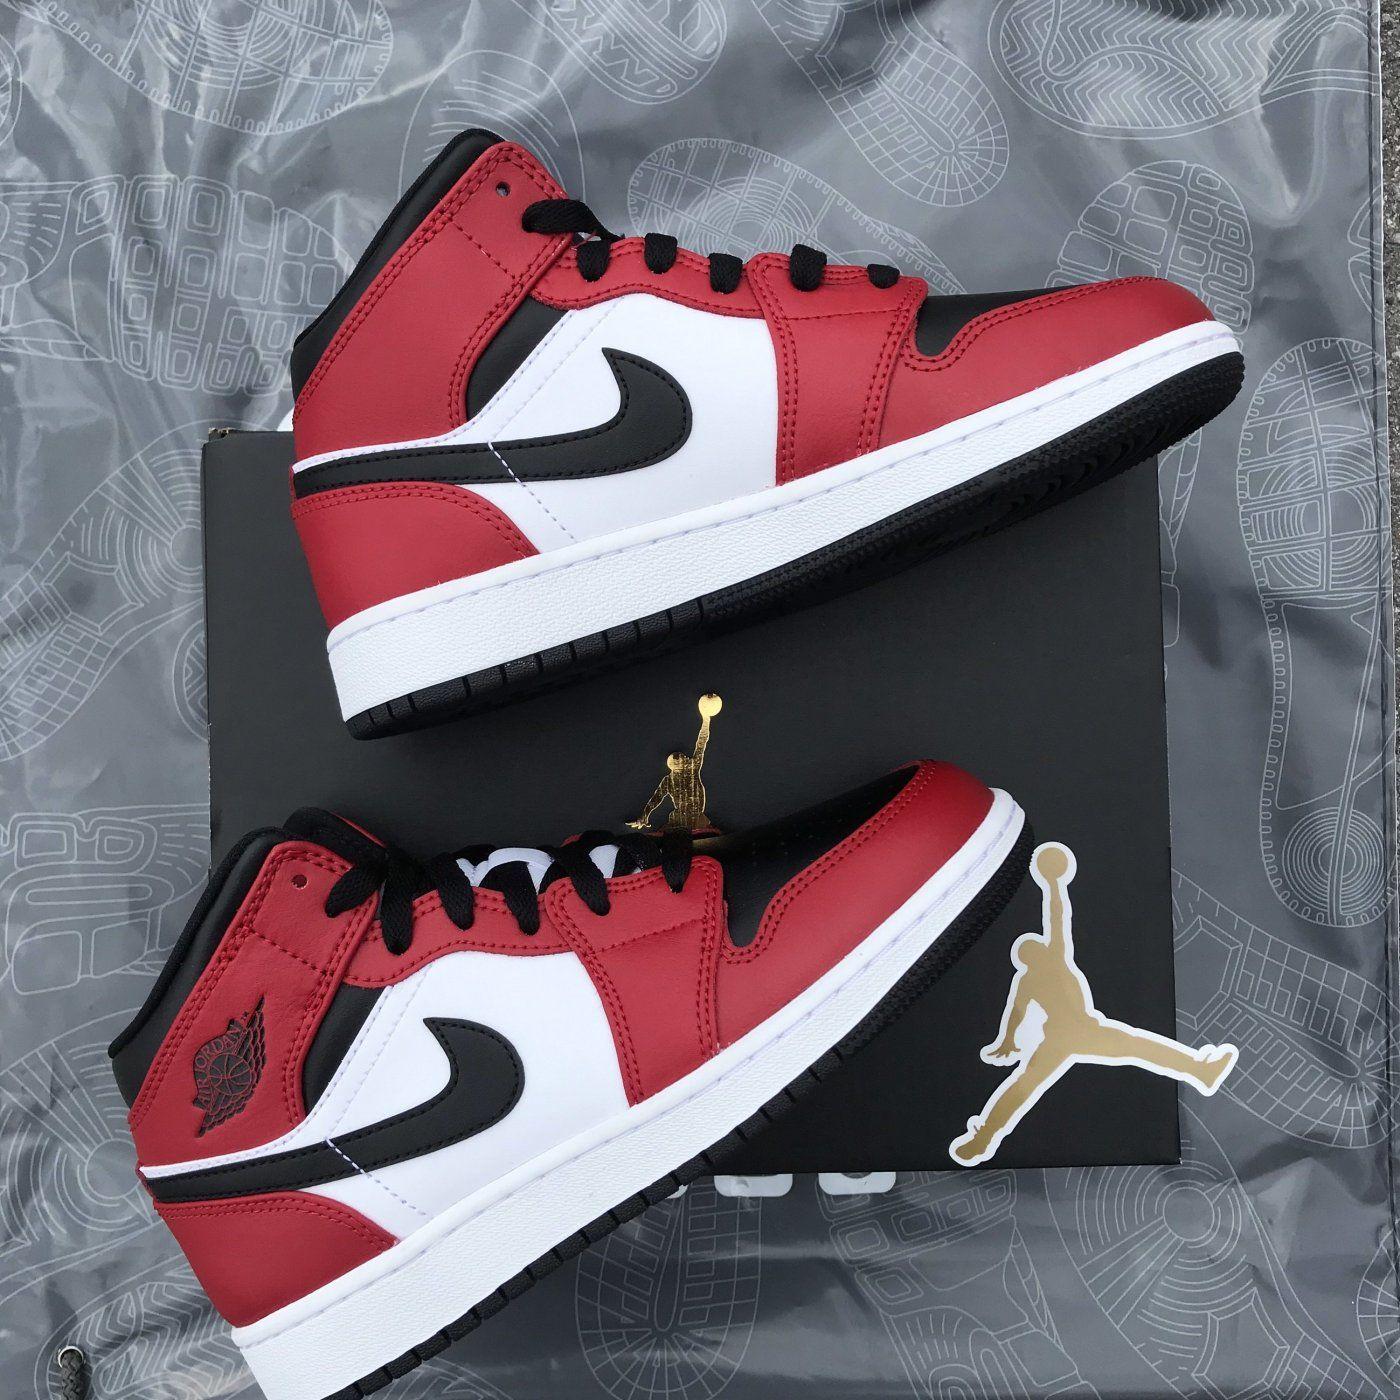 Jordan 1 Mid Chicago black toe in 2020 | Jordan shoes girls ...